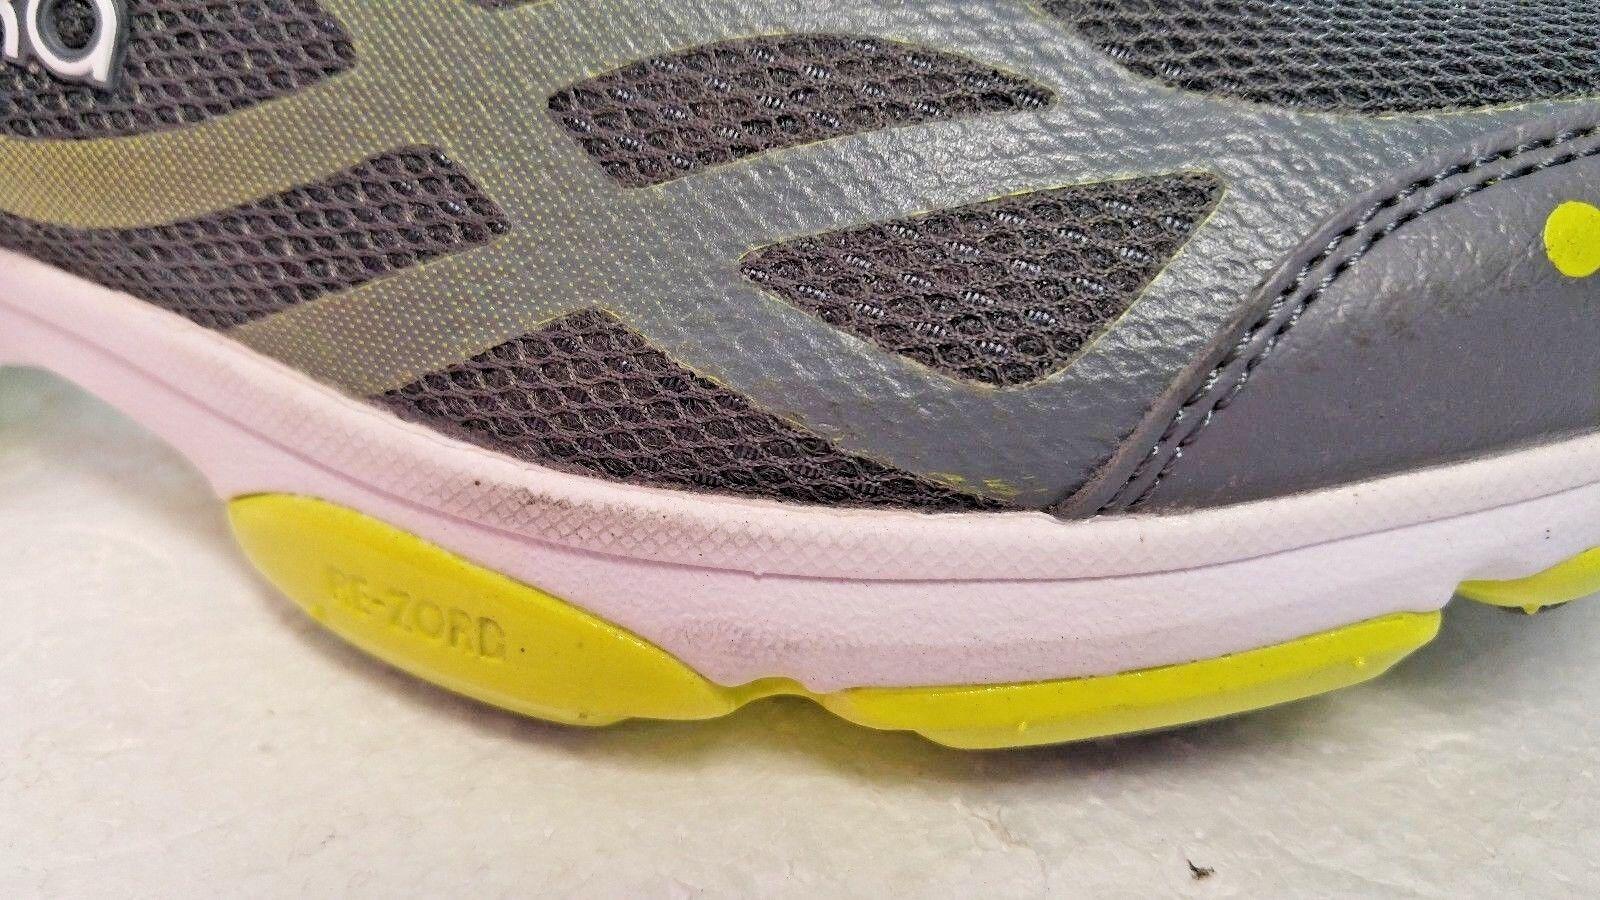 Ryka 8.5 Para Mujer tenis devoción XT, Gris/Limón/blanco, tamaño 8.5 Ryka W 6a4ab3